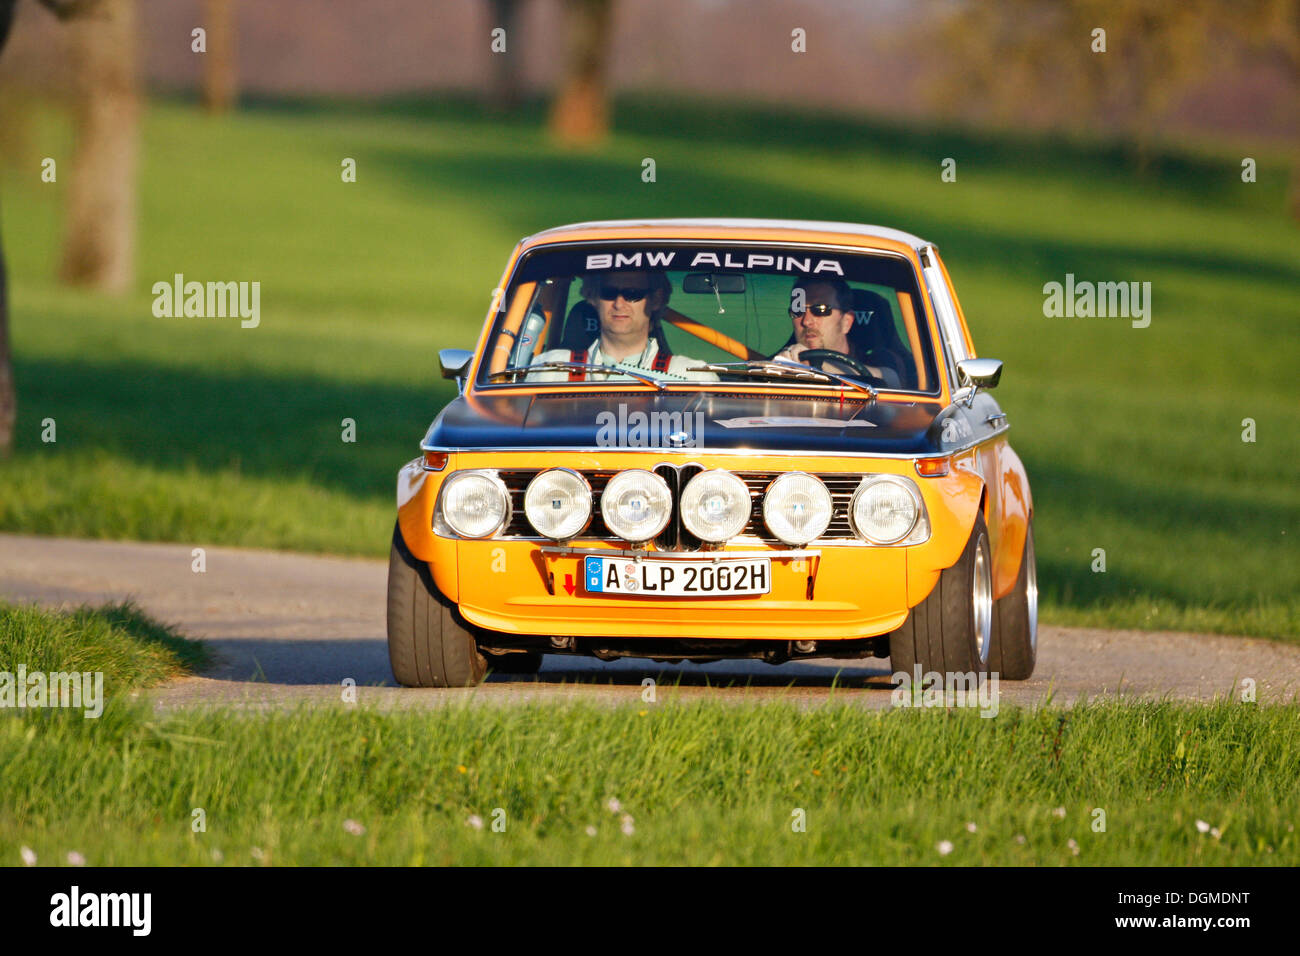 Bmw 2002ti Alpina Built In 1970 Langenburg Historic 2010 Stock Photo Alamy